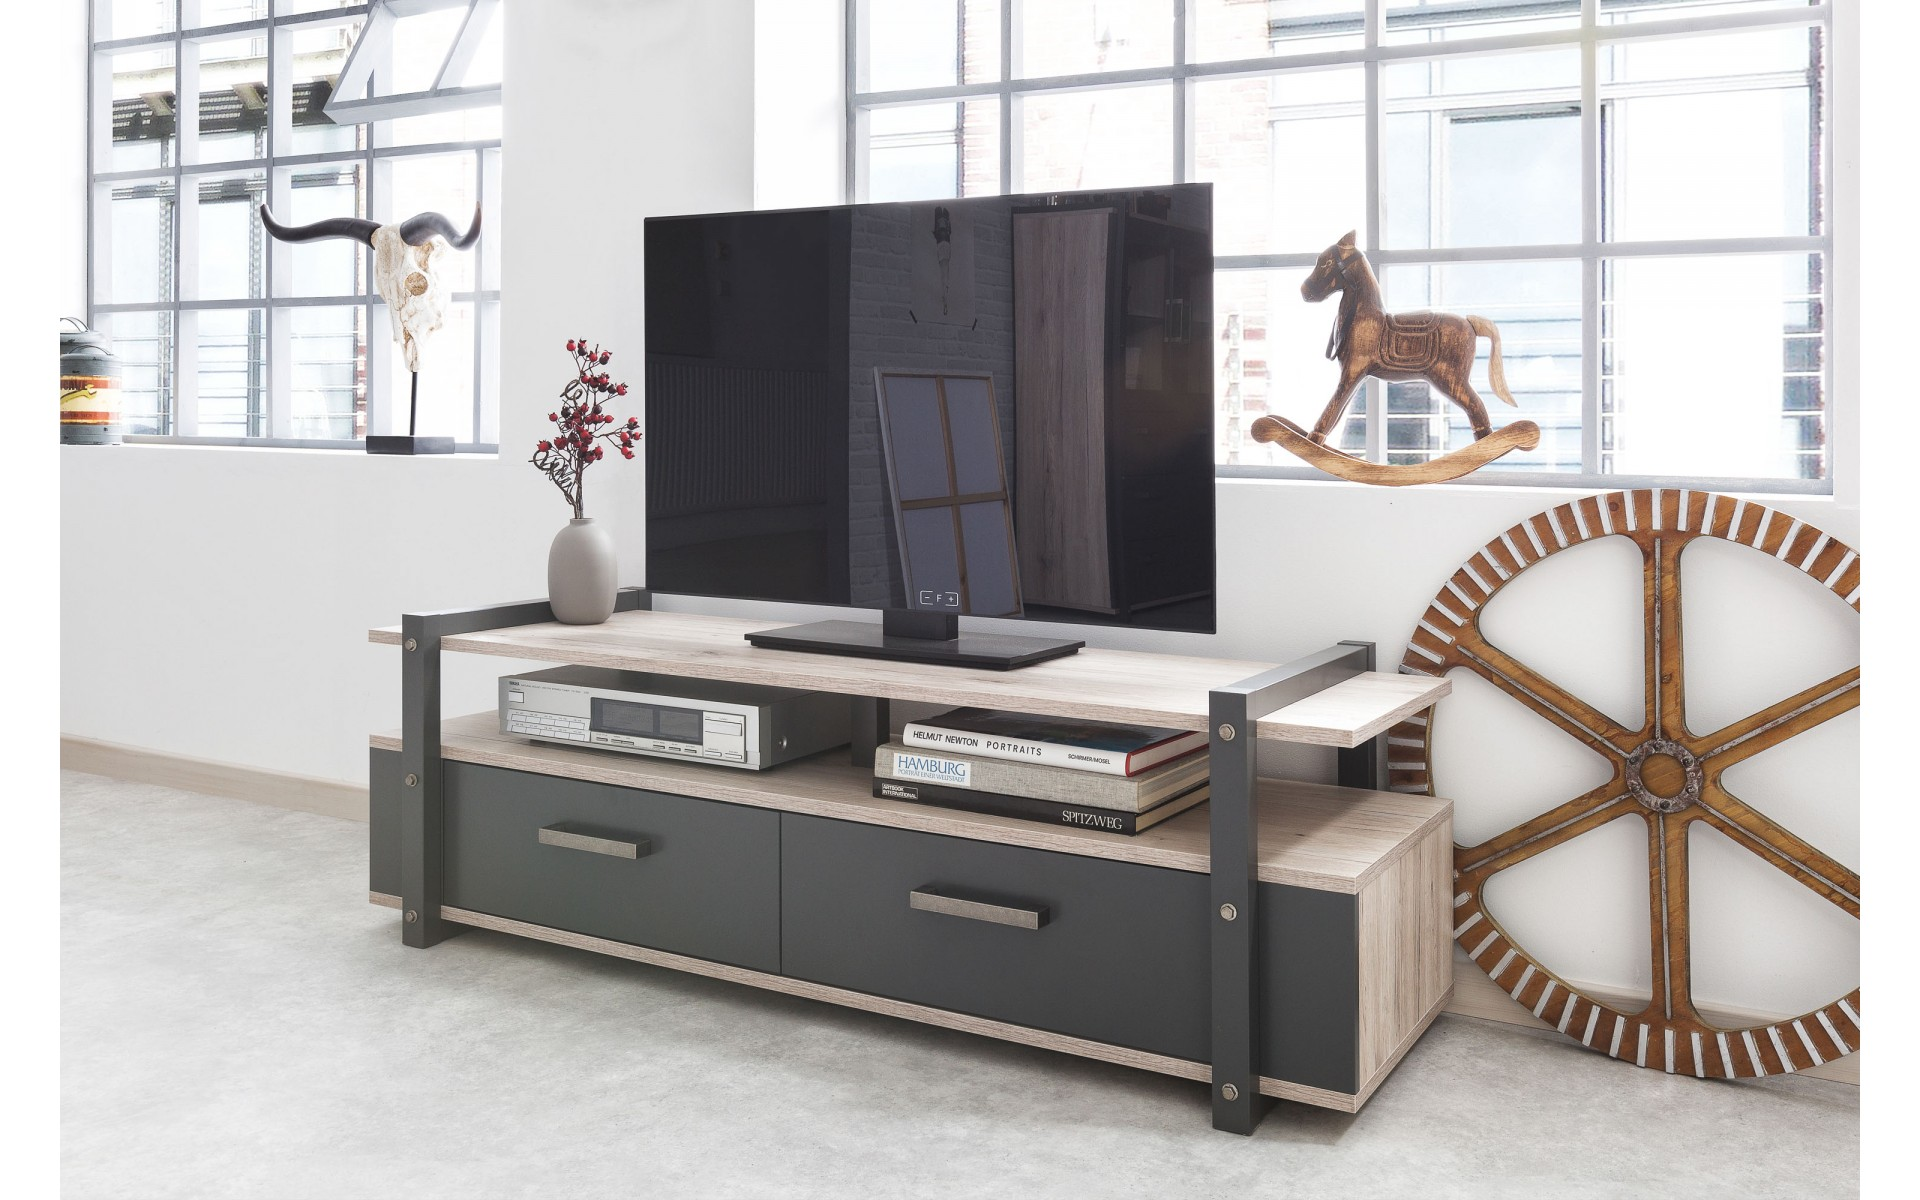 meuble tv industriel brooklyn top d co. Black Bedroom Furniture Sets. Home Design Ideas